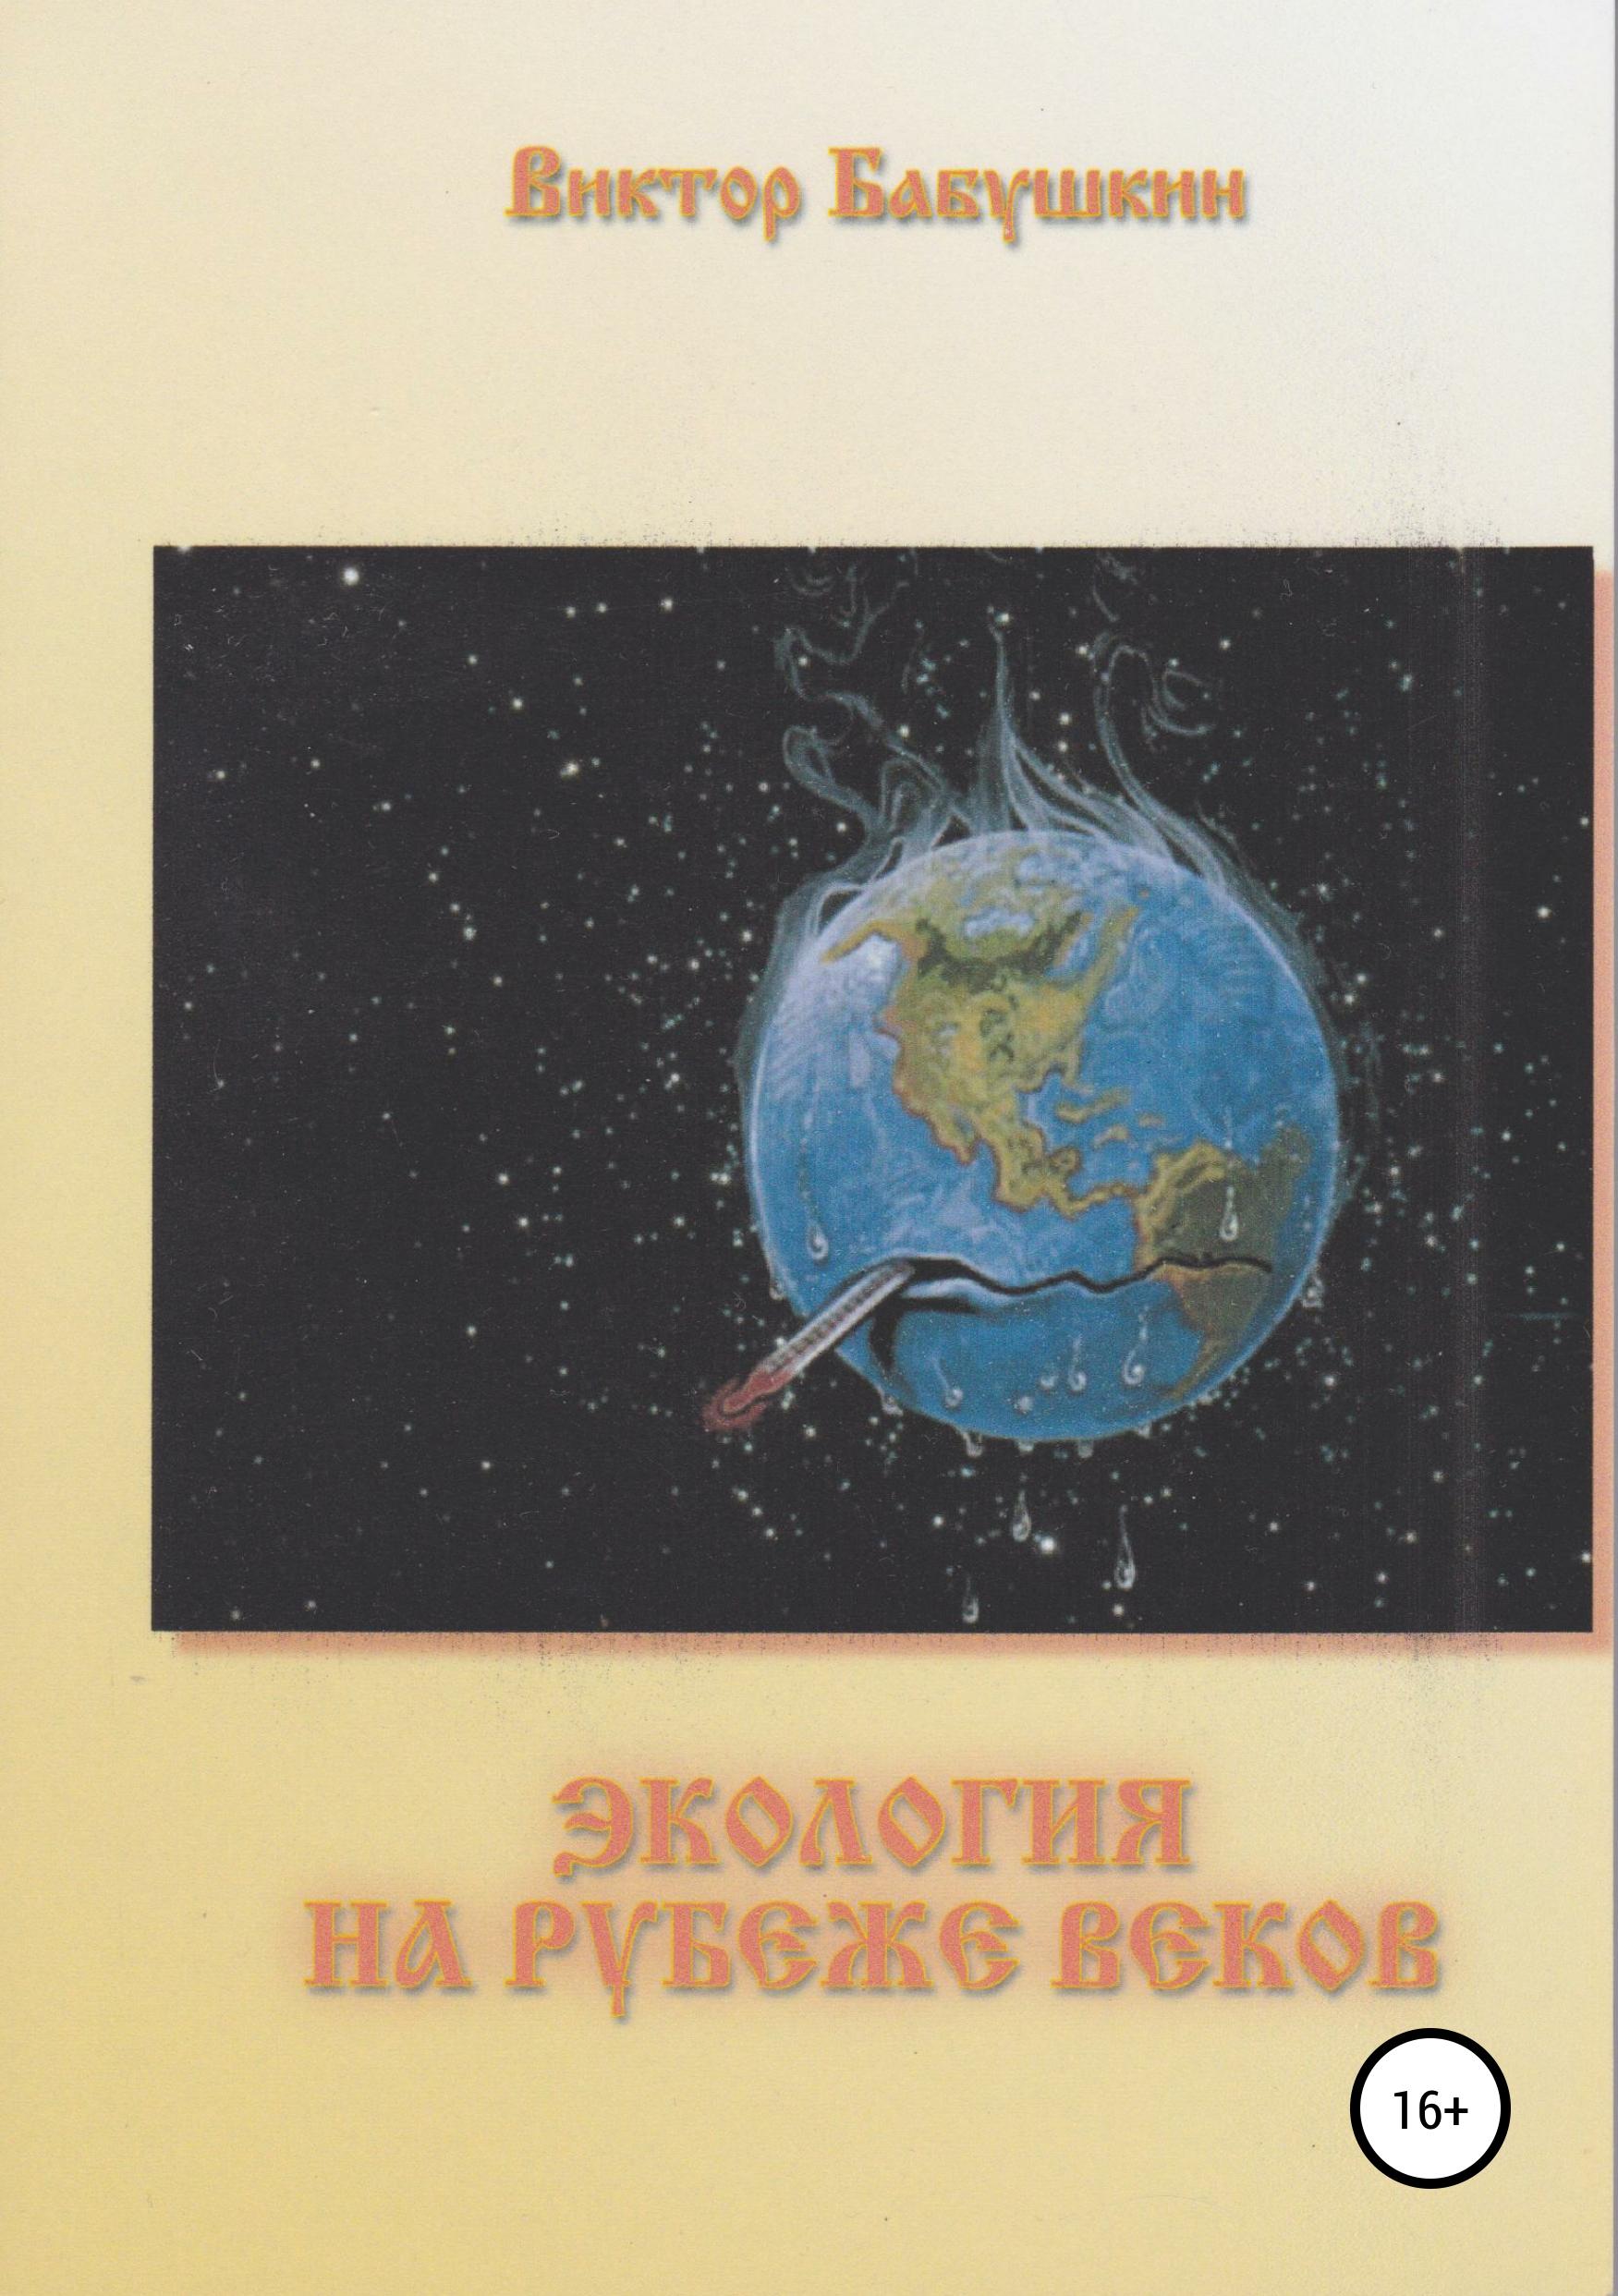 Фото - Виктор Евгеньевич Бабушкин Экология на рубеже веков виктор евгеньевич бабушкин тайны мироздания